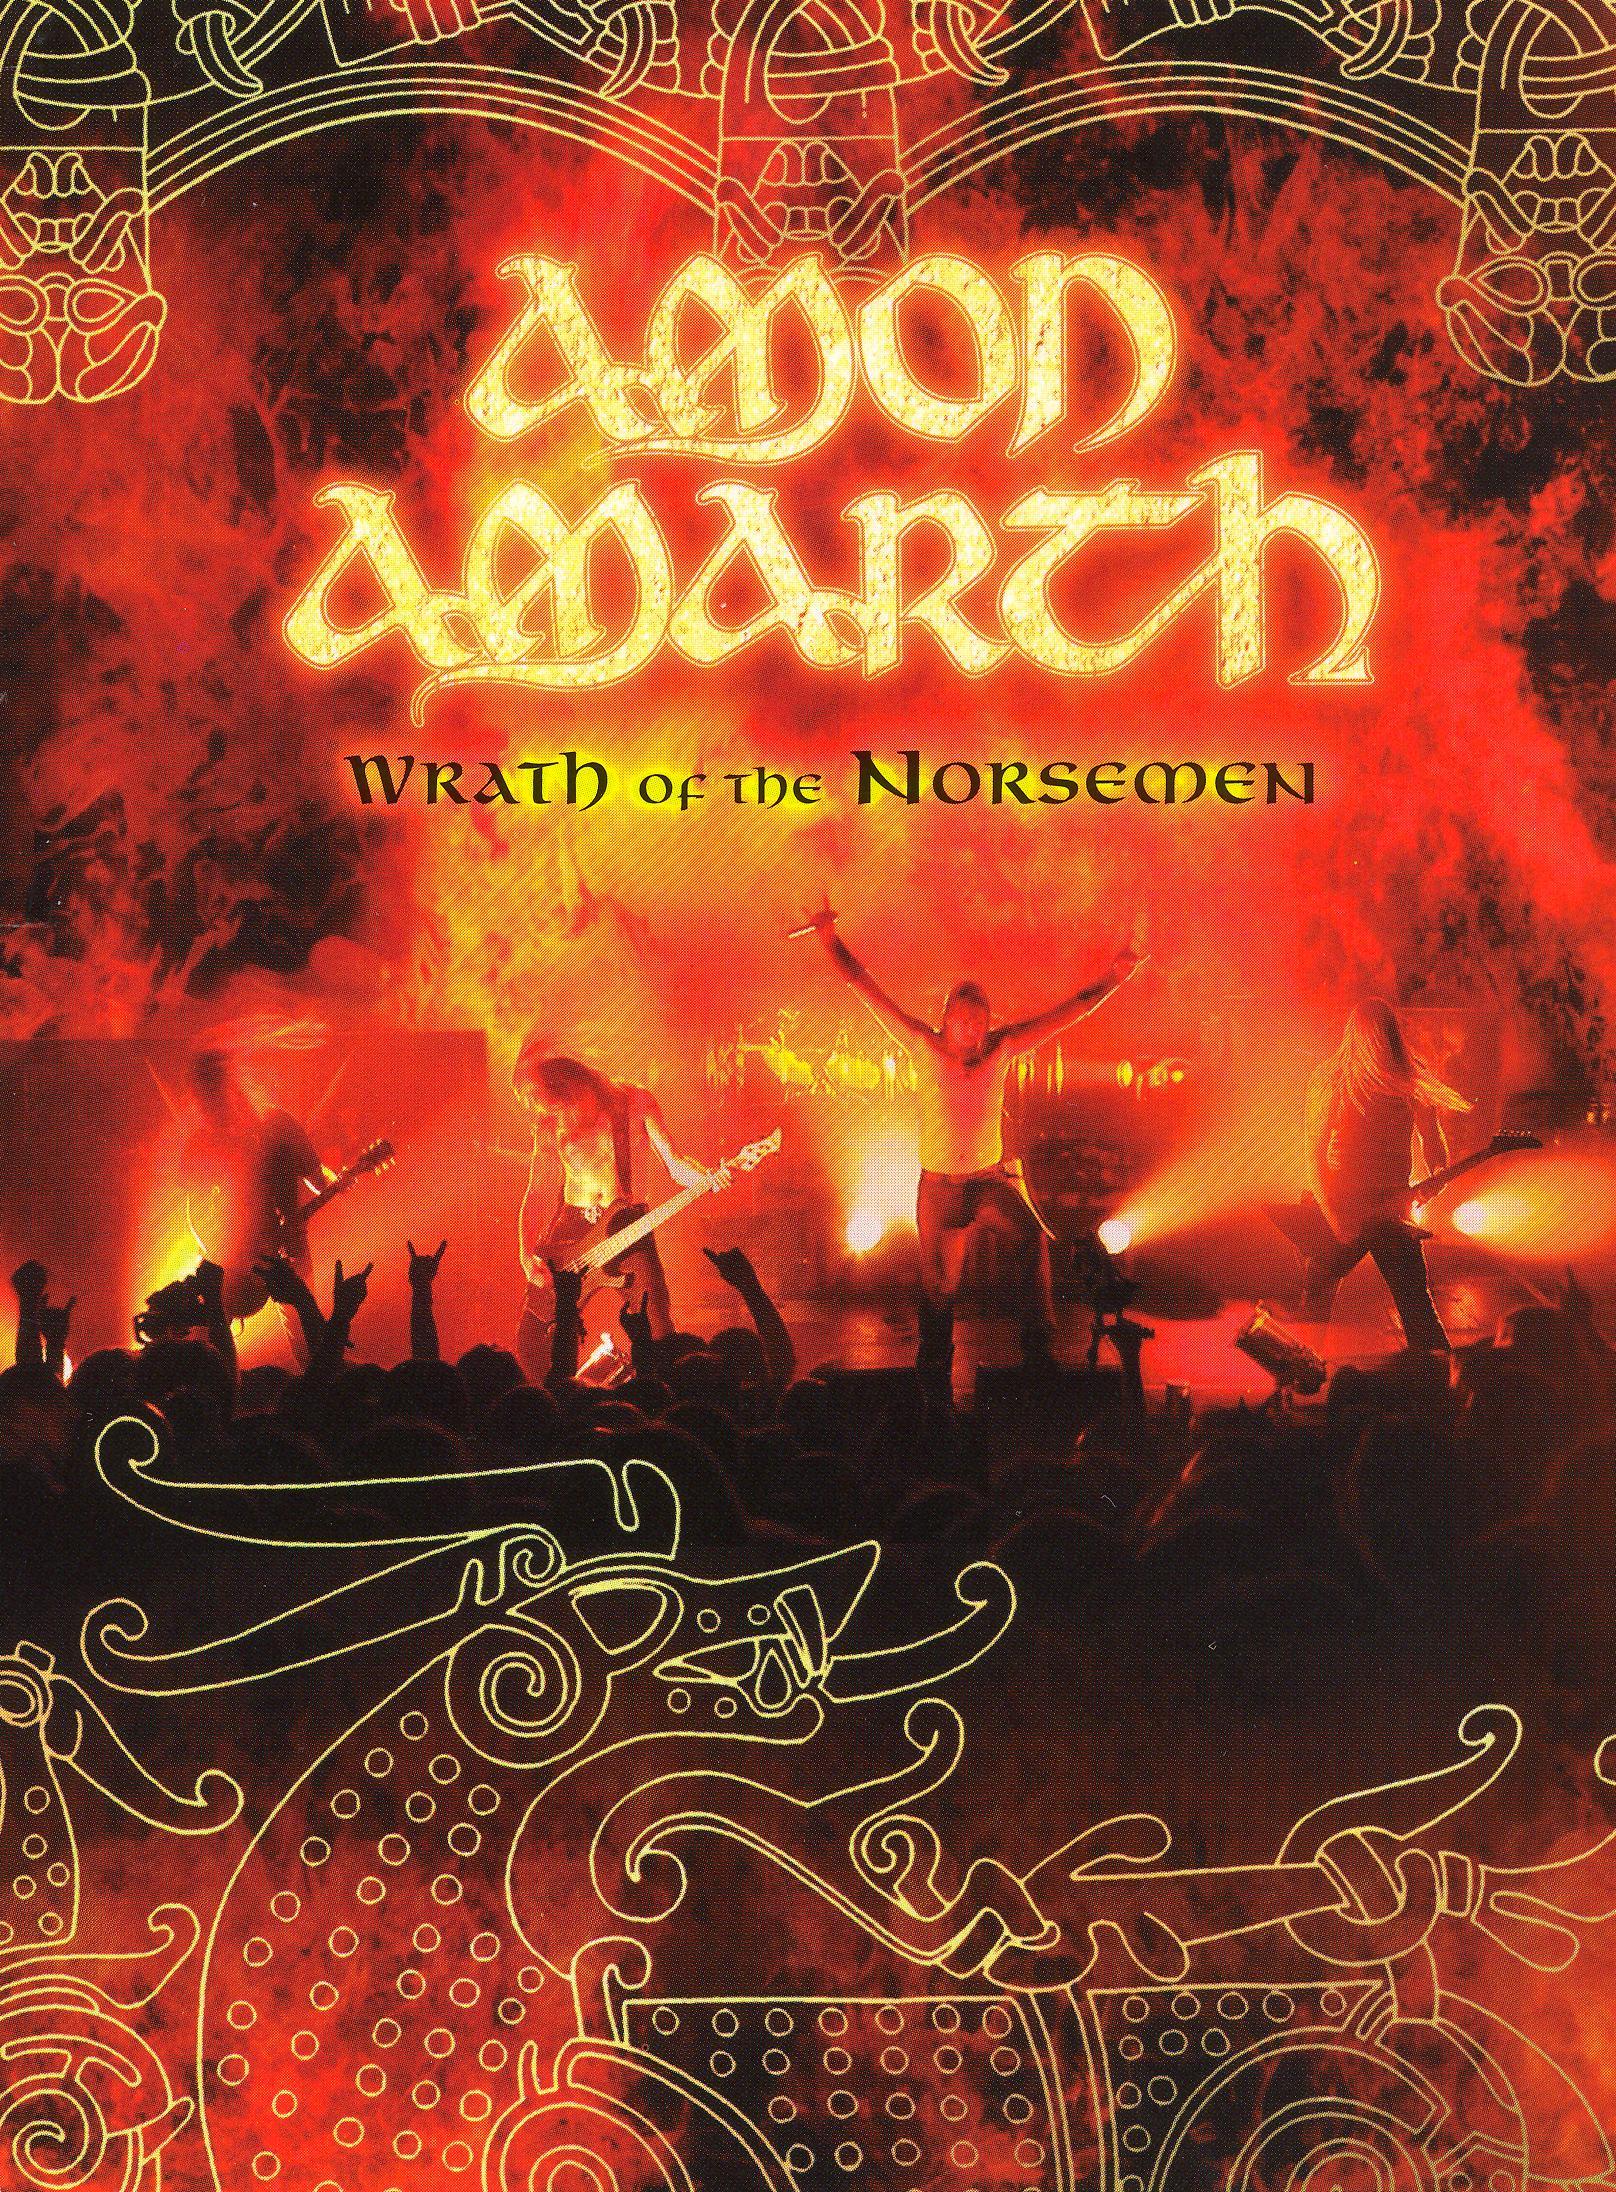 Amon Amarth: Wrath of the Norsemen